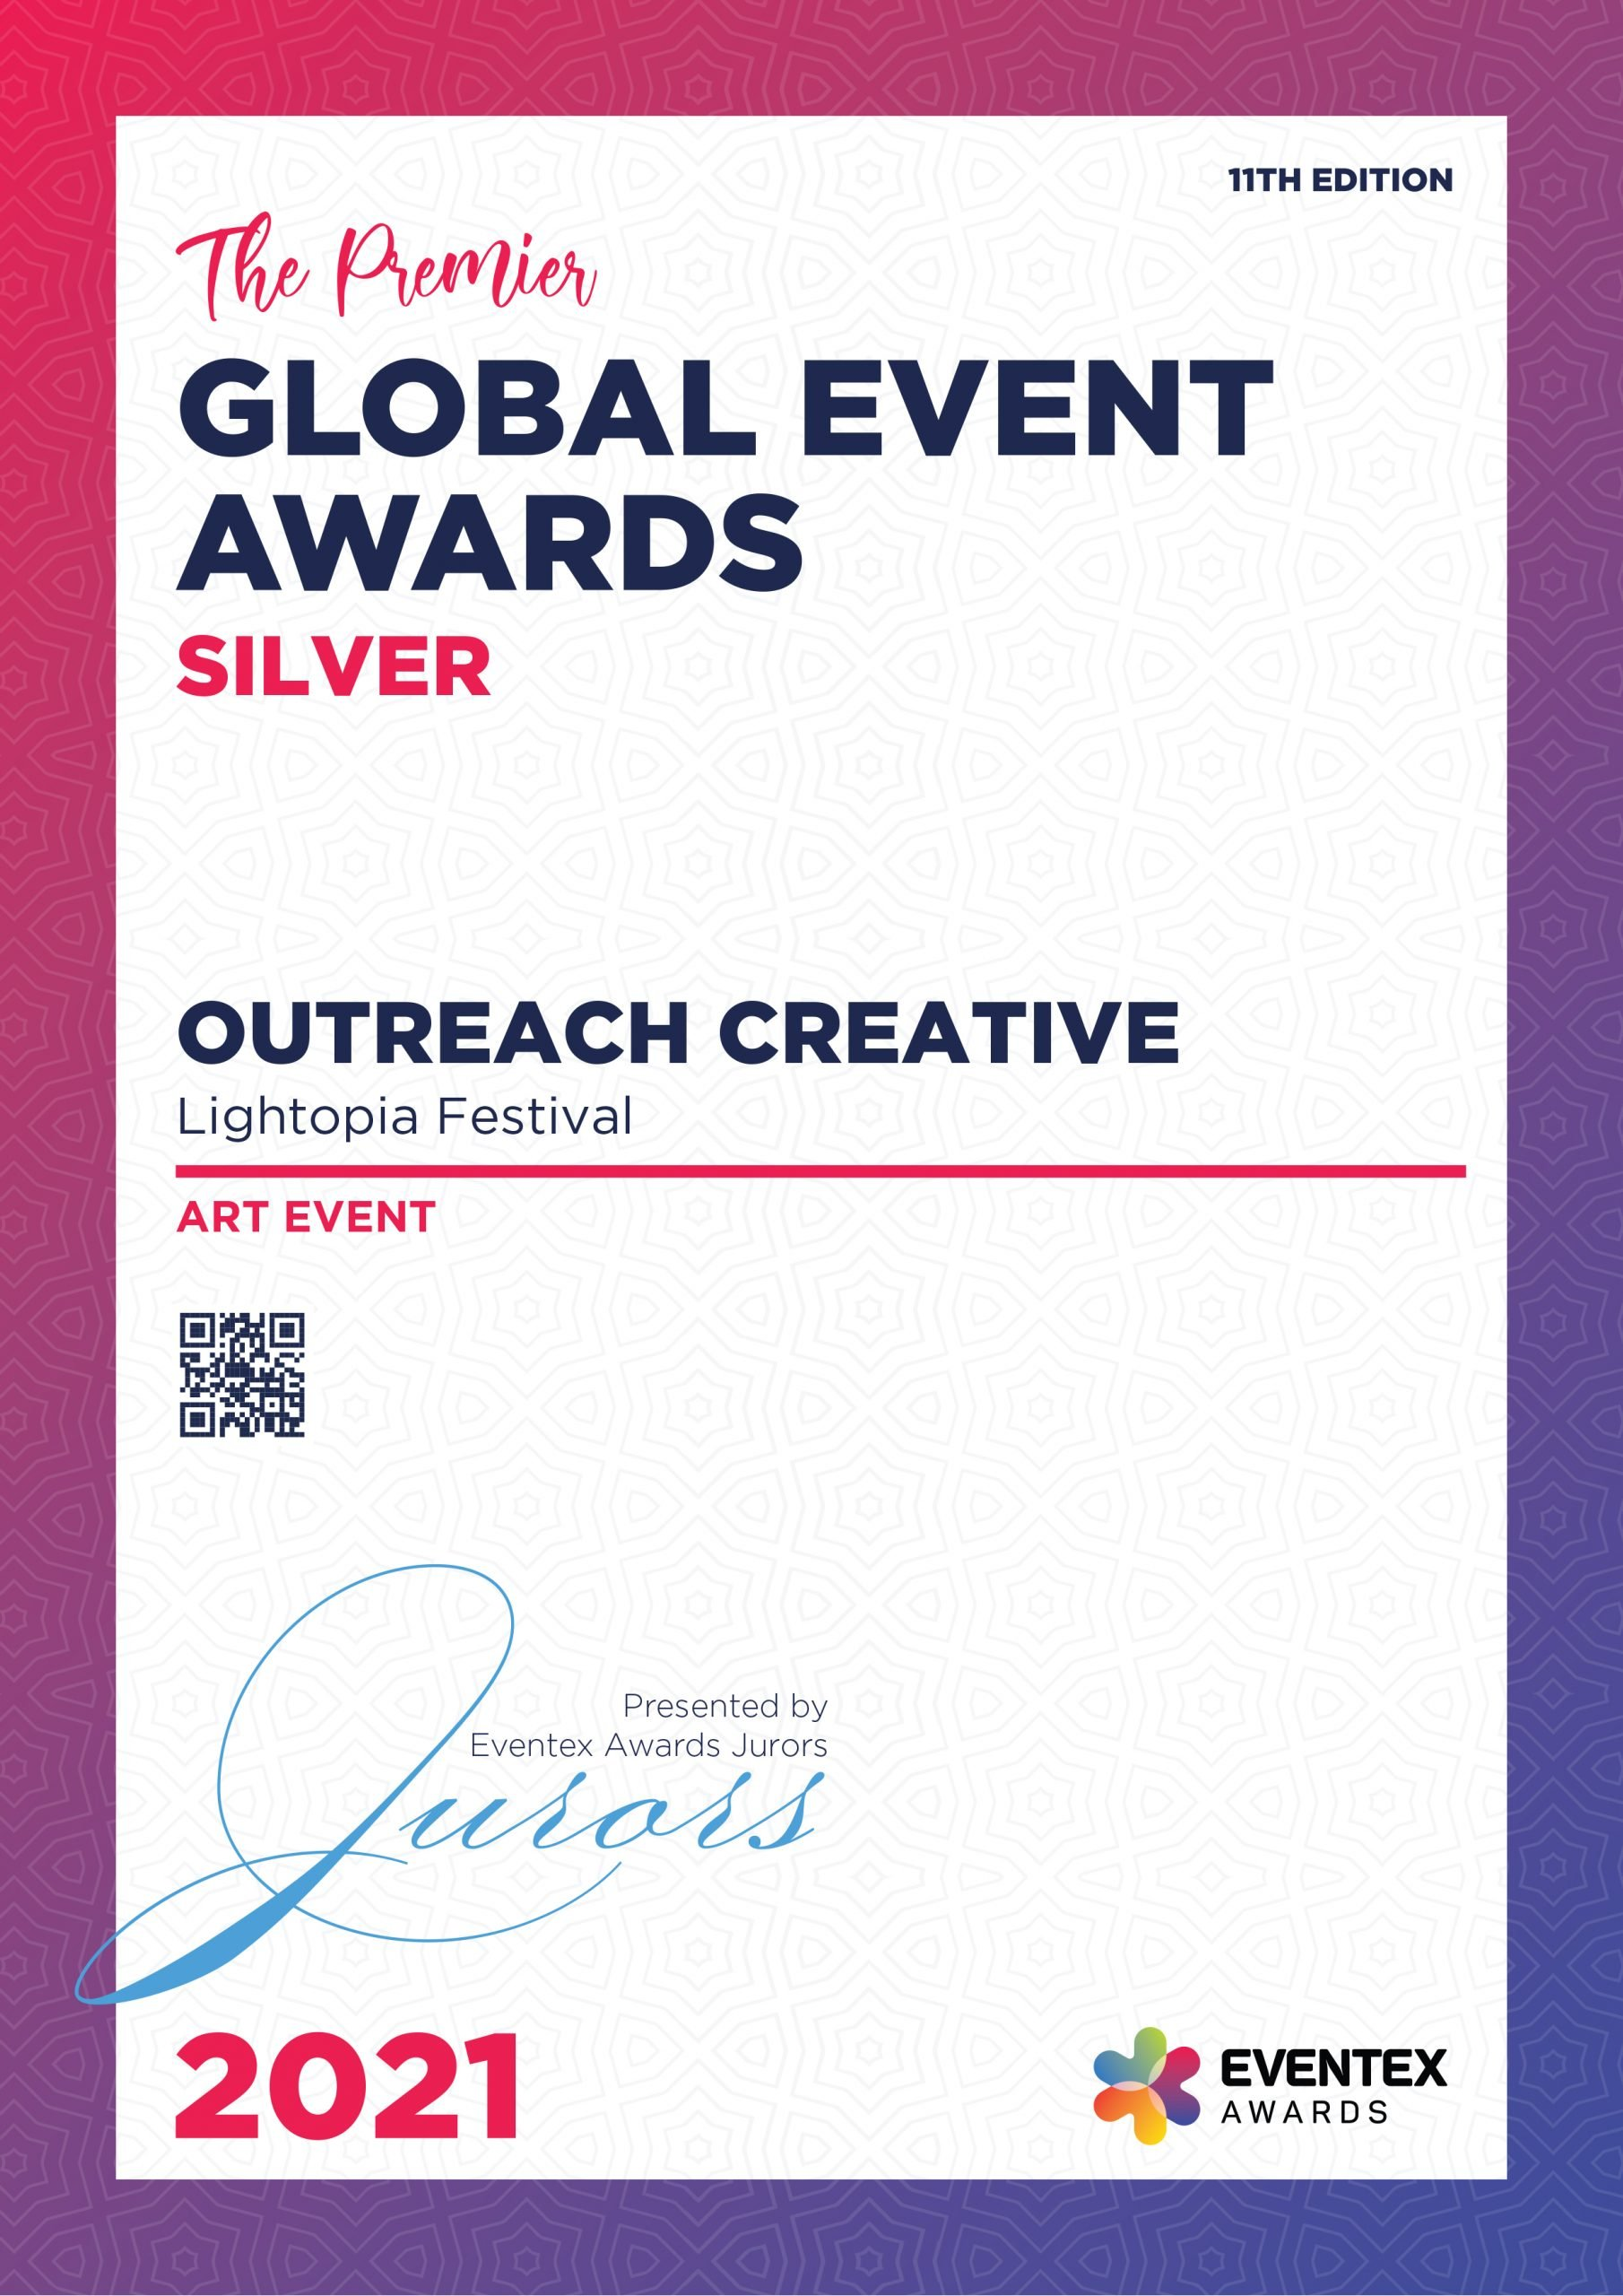 OUTREACH CREATIVE-Art Event-Silver-Eventex-2021